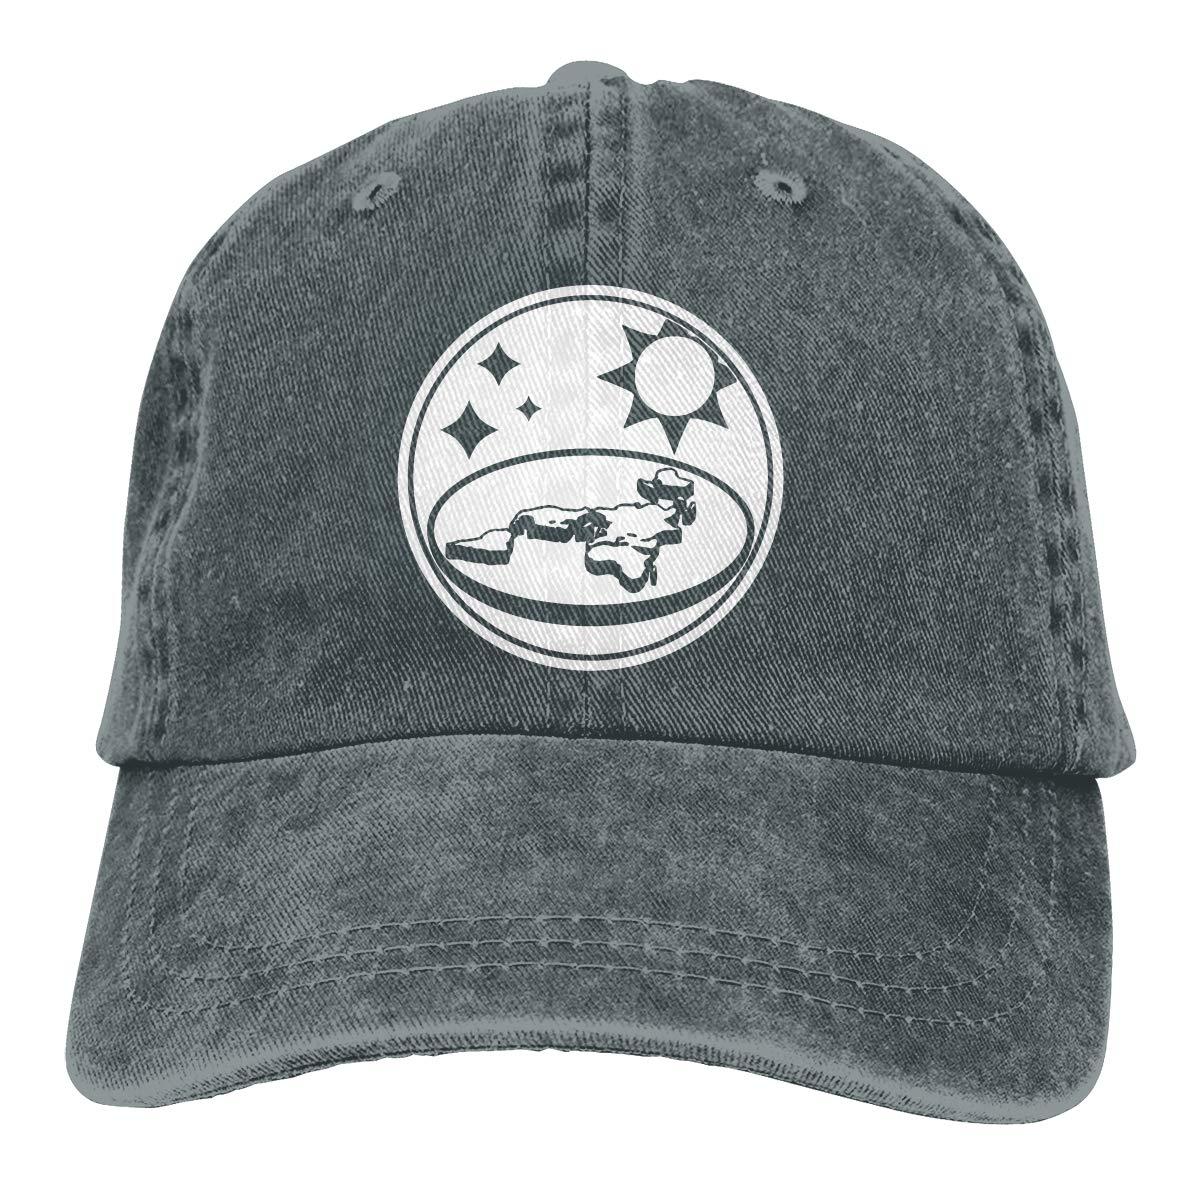 18477c803c1 Amazon.com  Trucker Cap United States Forest Service Durable Baseball Cap  Hats Adjustable Dad Hat Black  Clothing